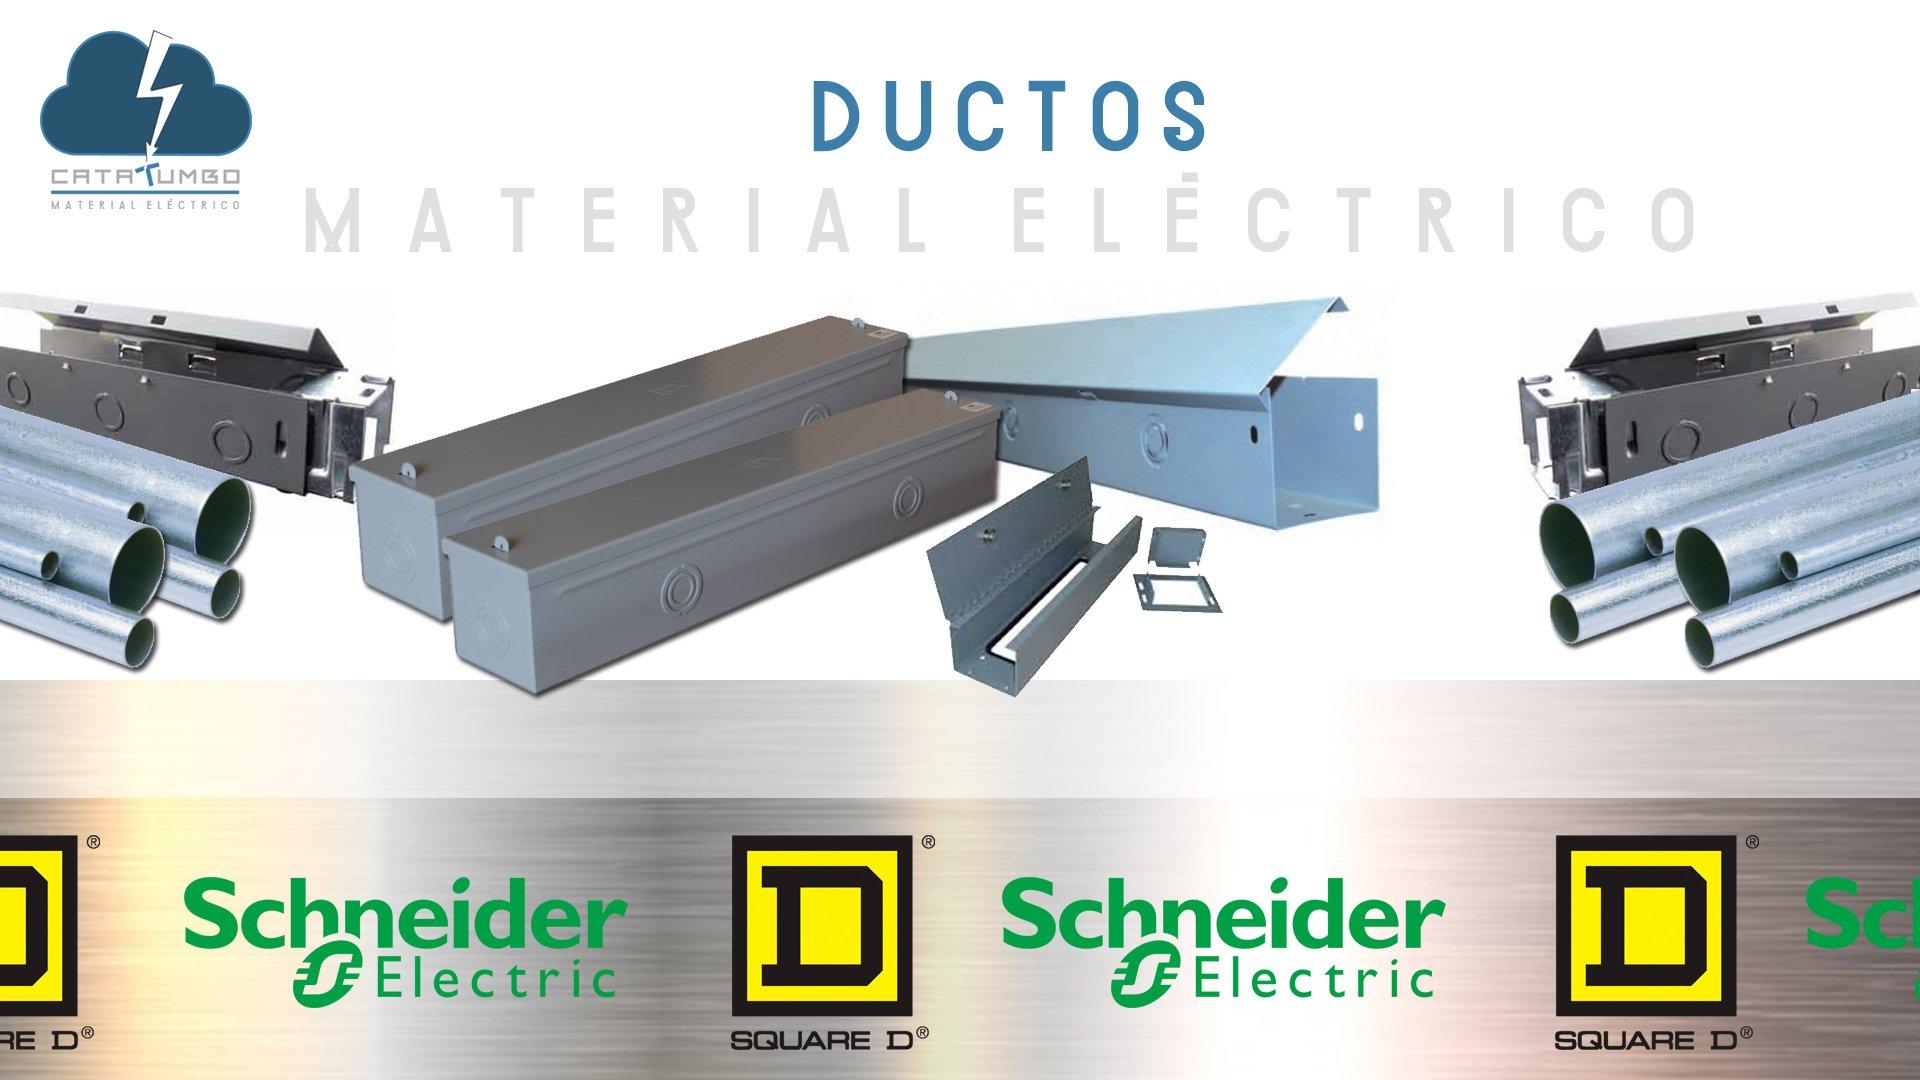 ductos-eléctricos-square-d-schneider-electric-material-eléctrico-catatumbo